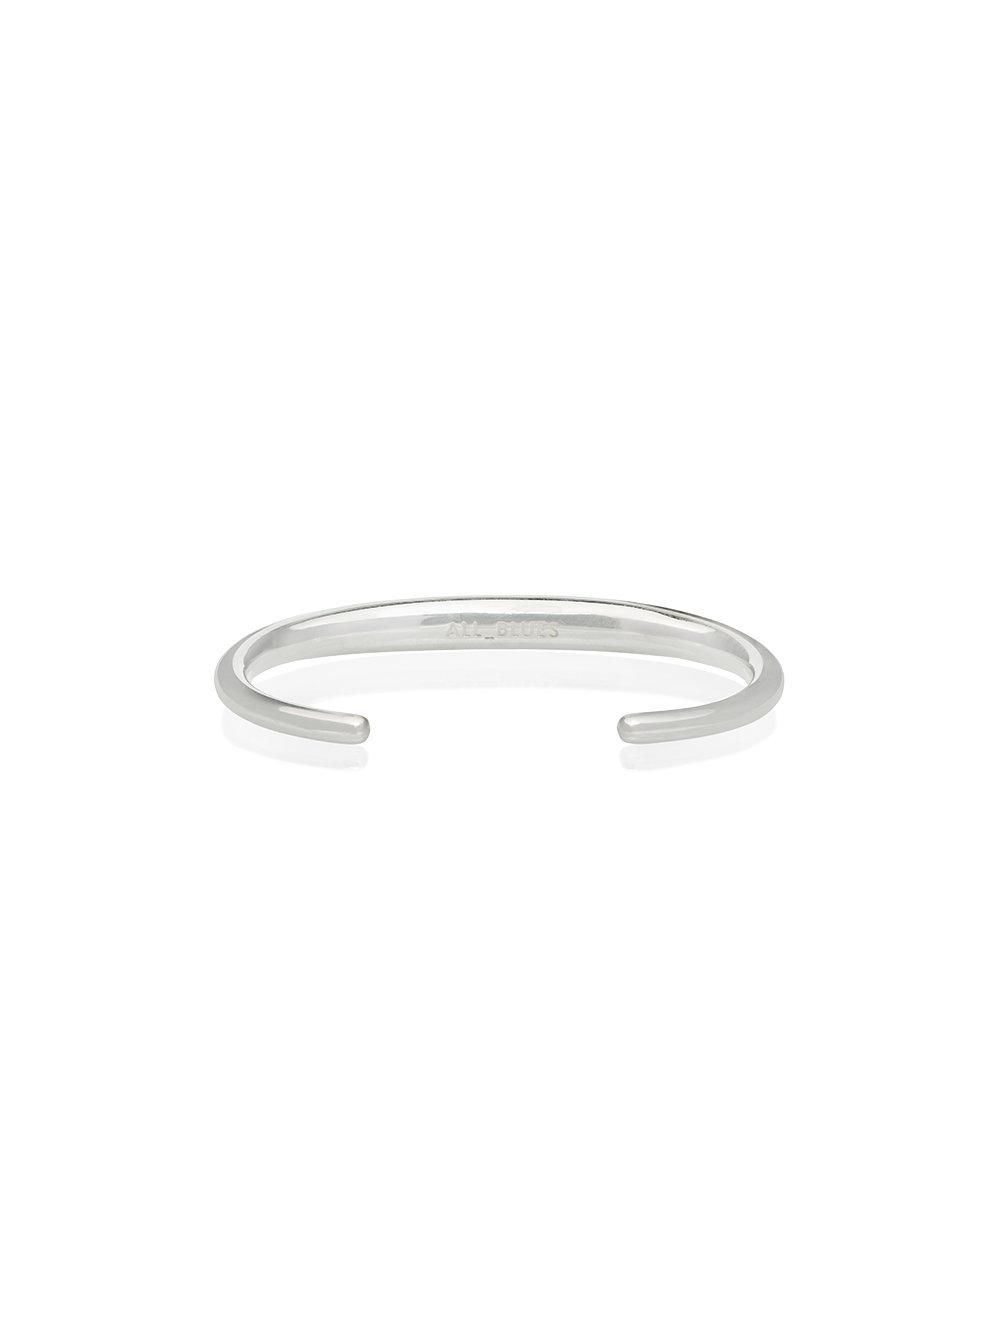 All_Blues Gold Fat Snake Bracelet - Metallic cyaJWUskbc